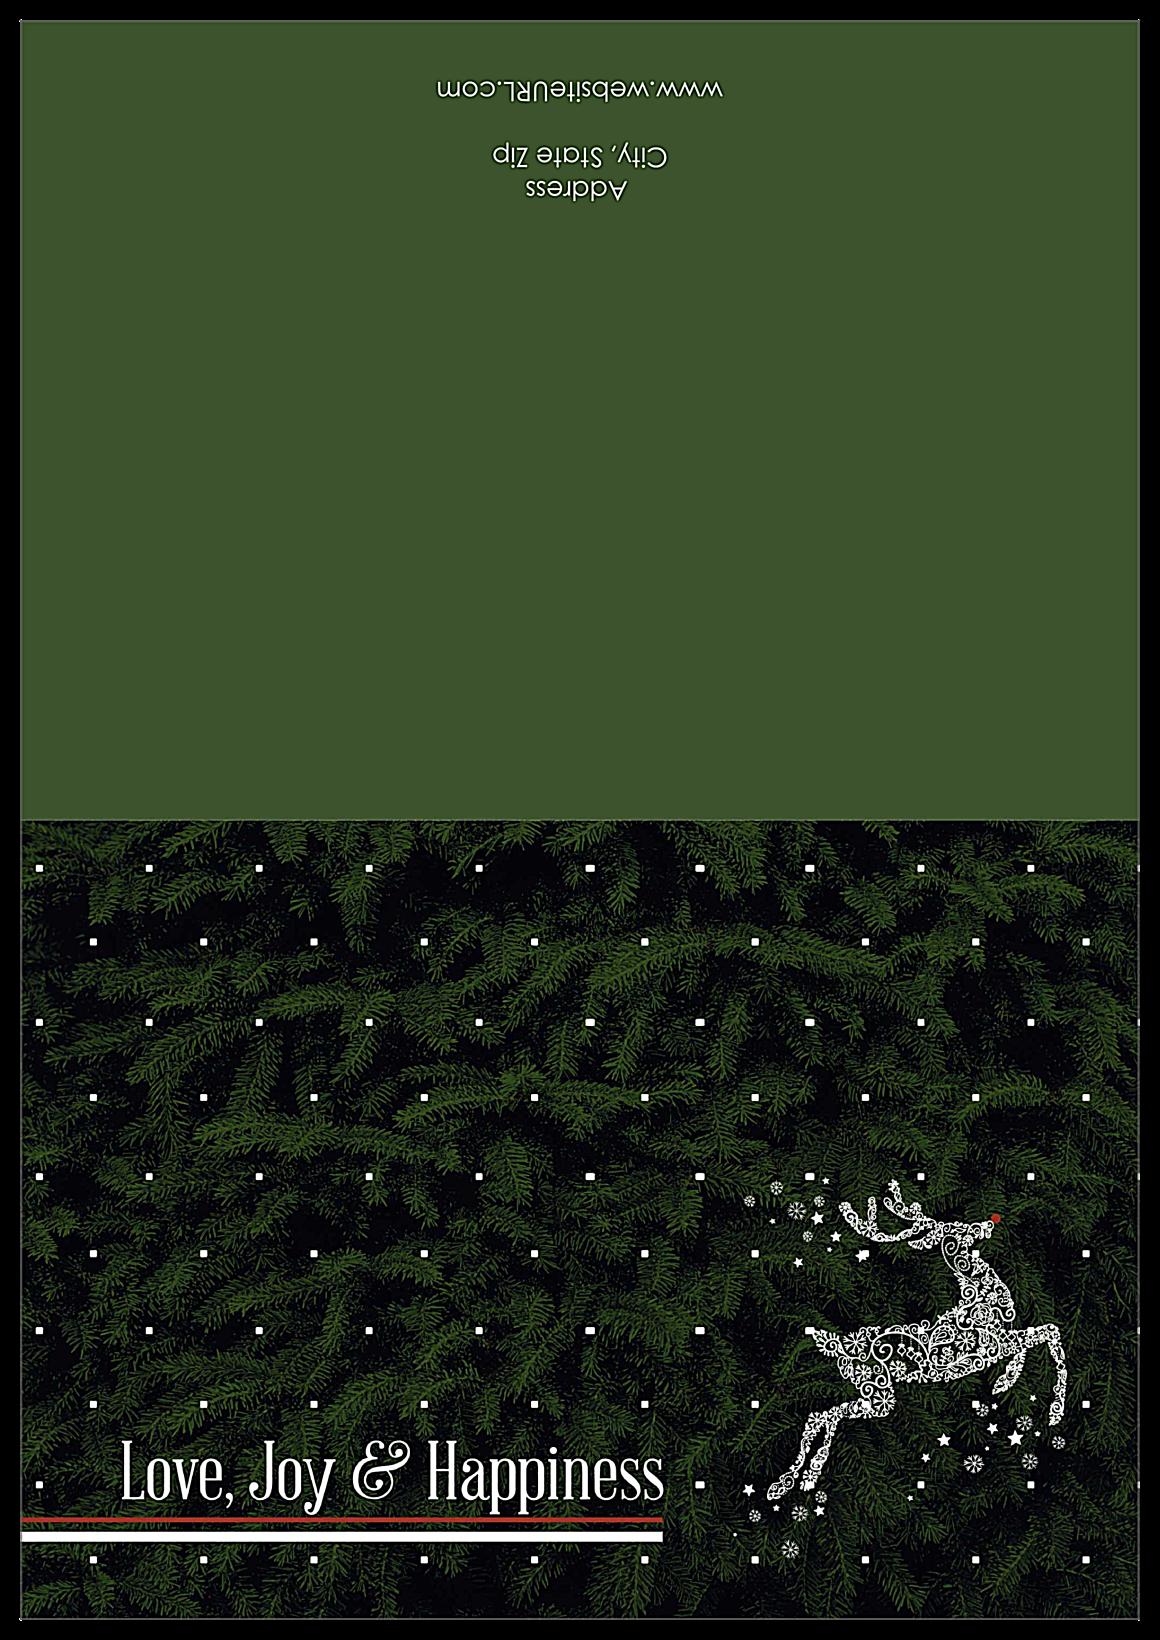 Swirl Reindeer front - Greeting Cards Maker